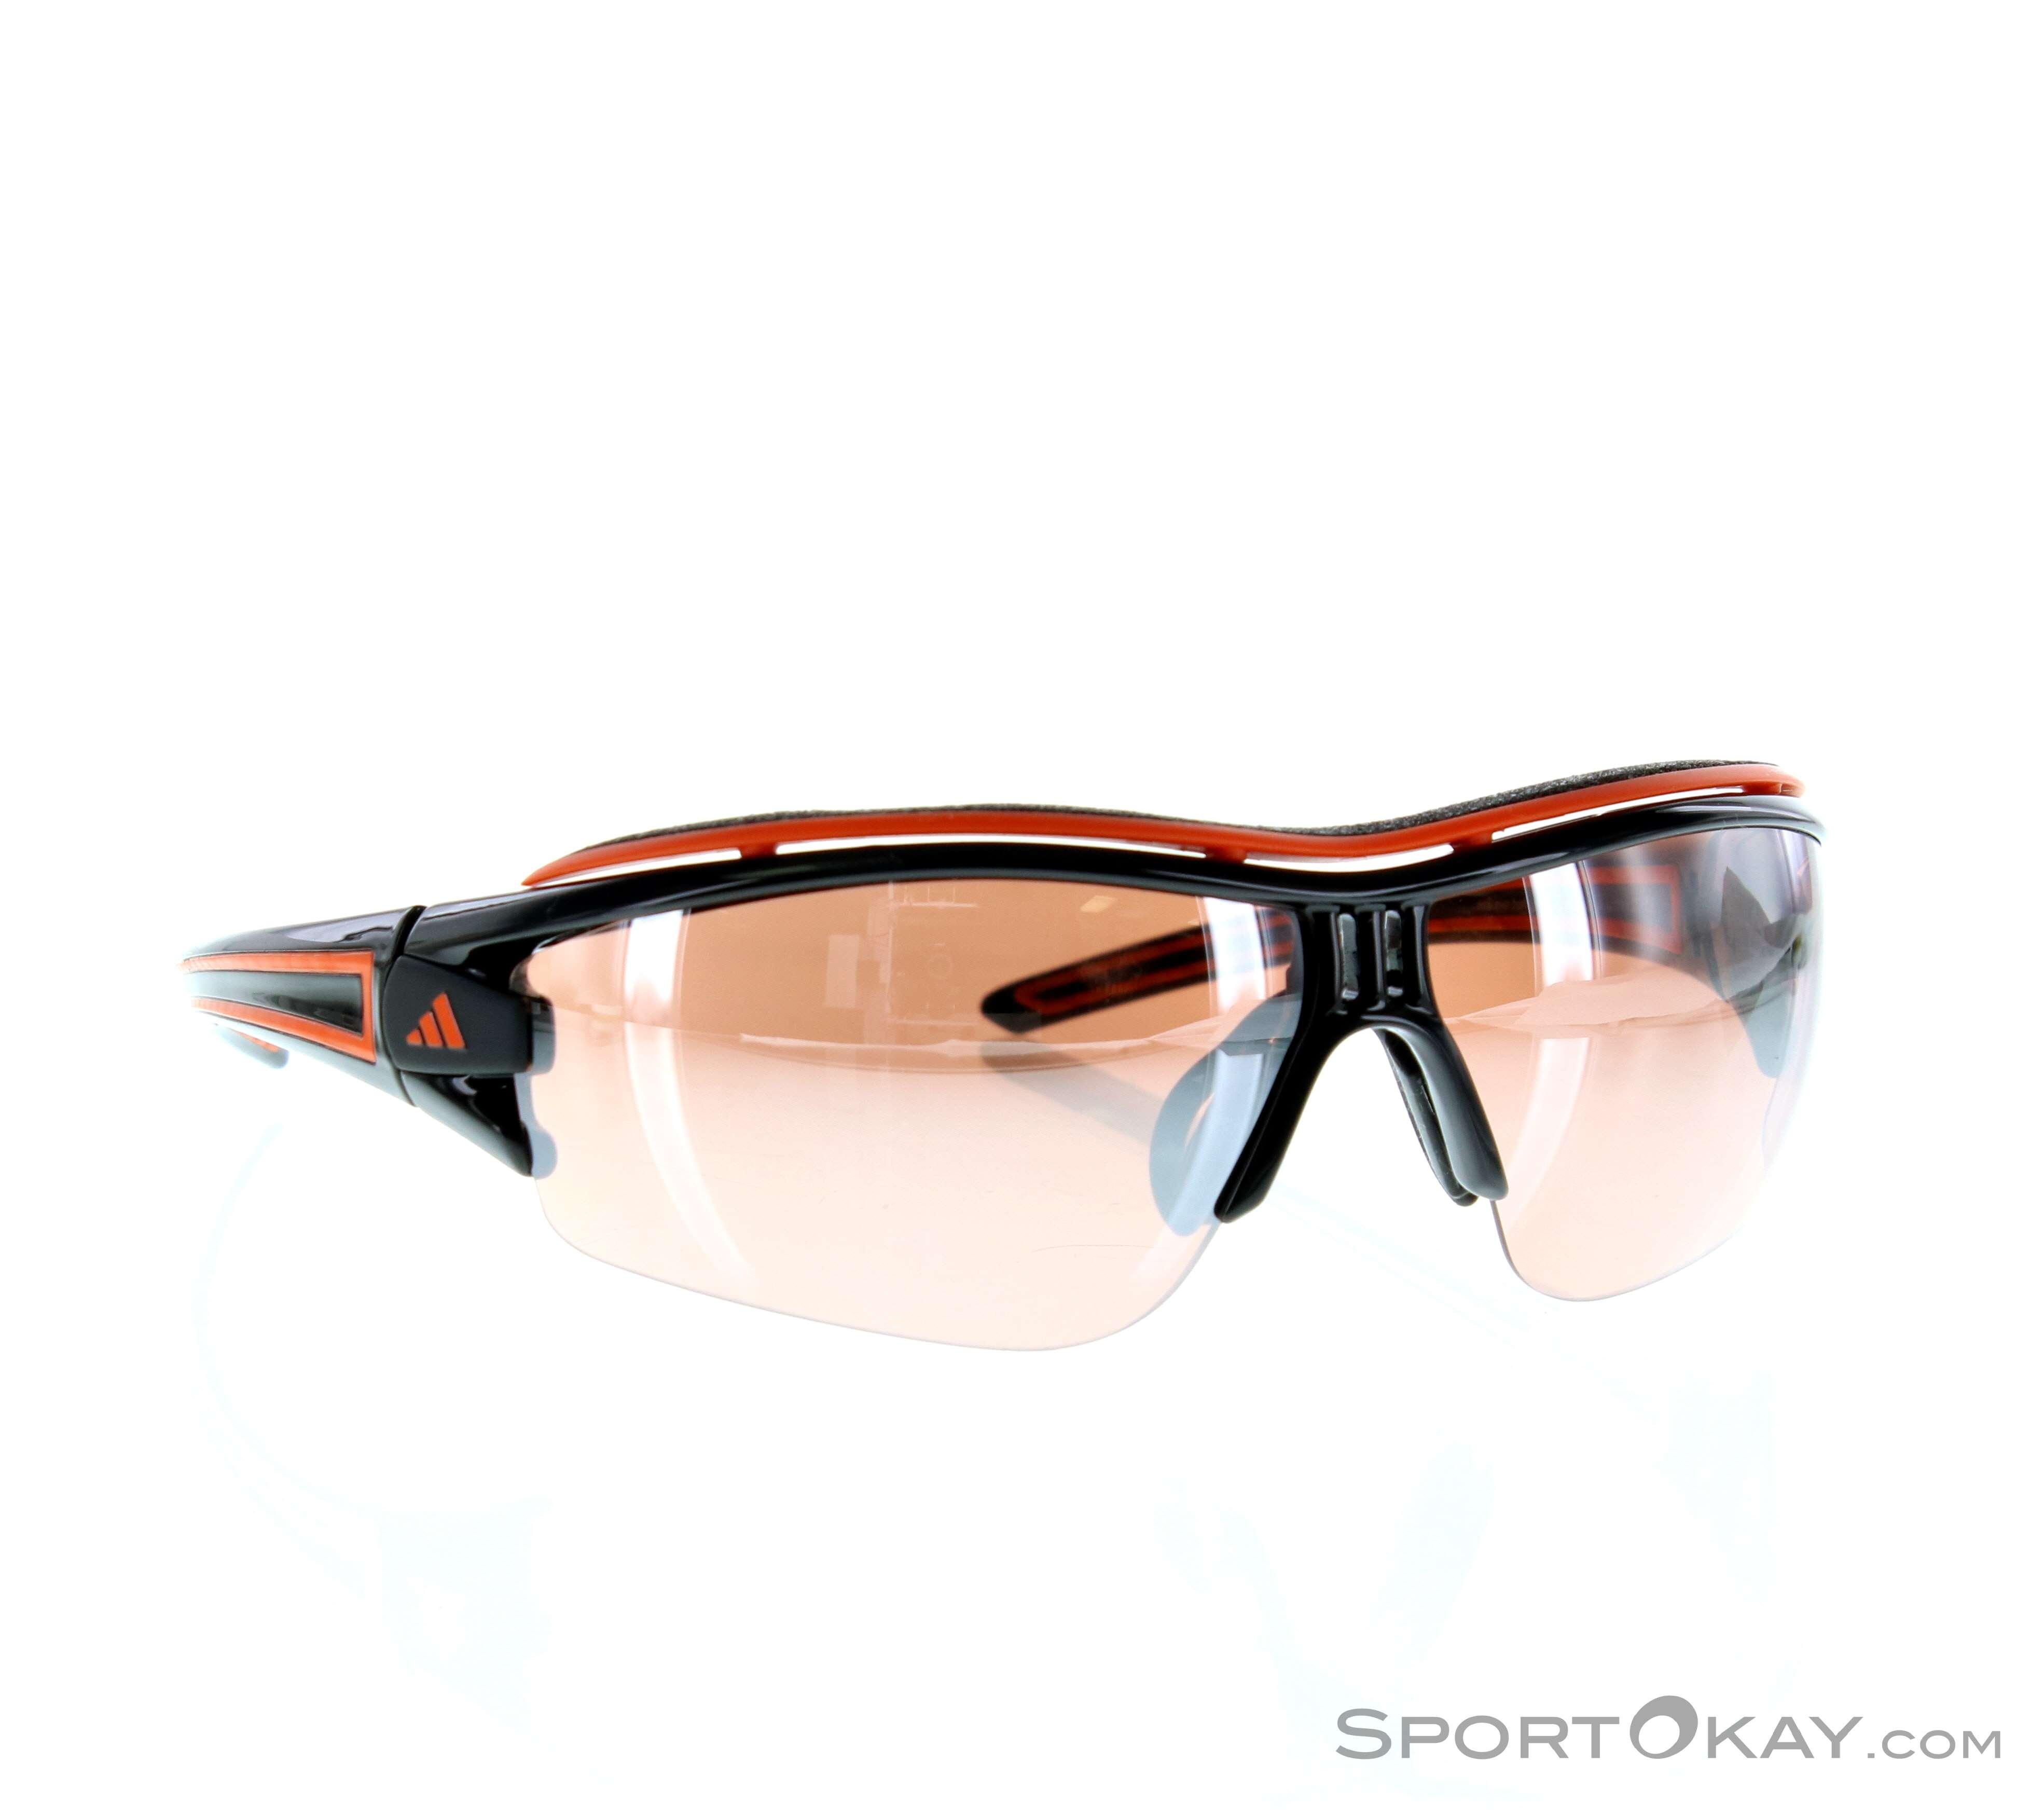 316fcba4920 Buy adidas evil eye half rim sunglasses   OFF57% Discounted